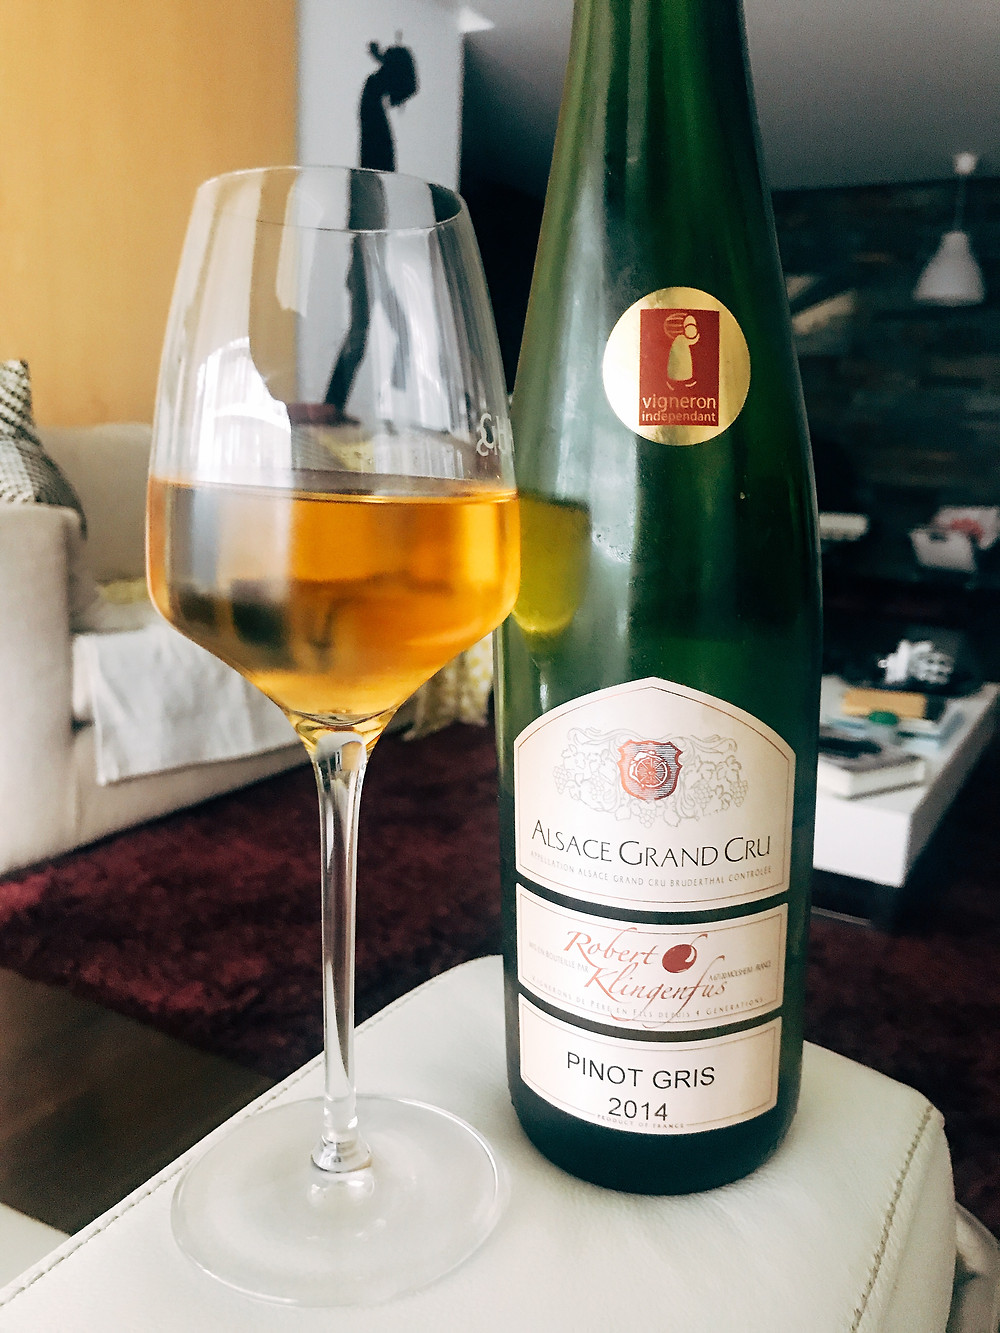 Robert Klingenfus Pinot Gris Grand Cru Bruderthal 2014